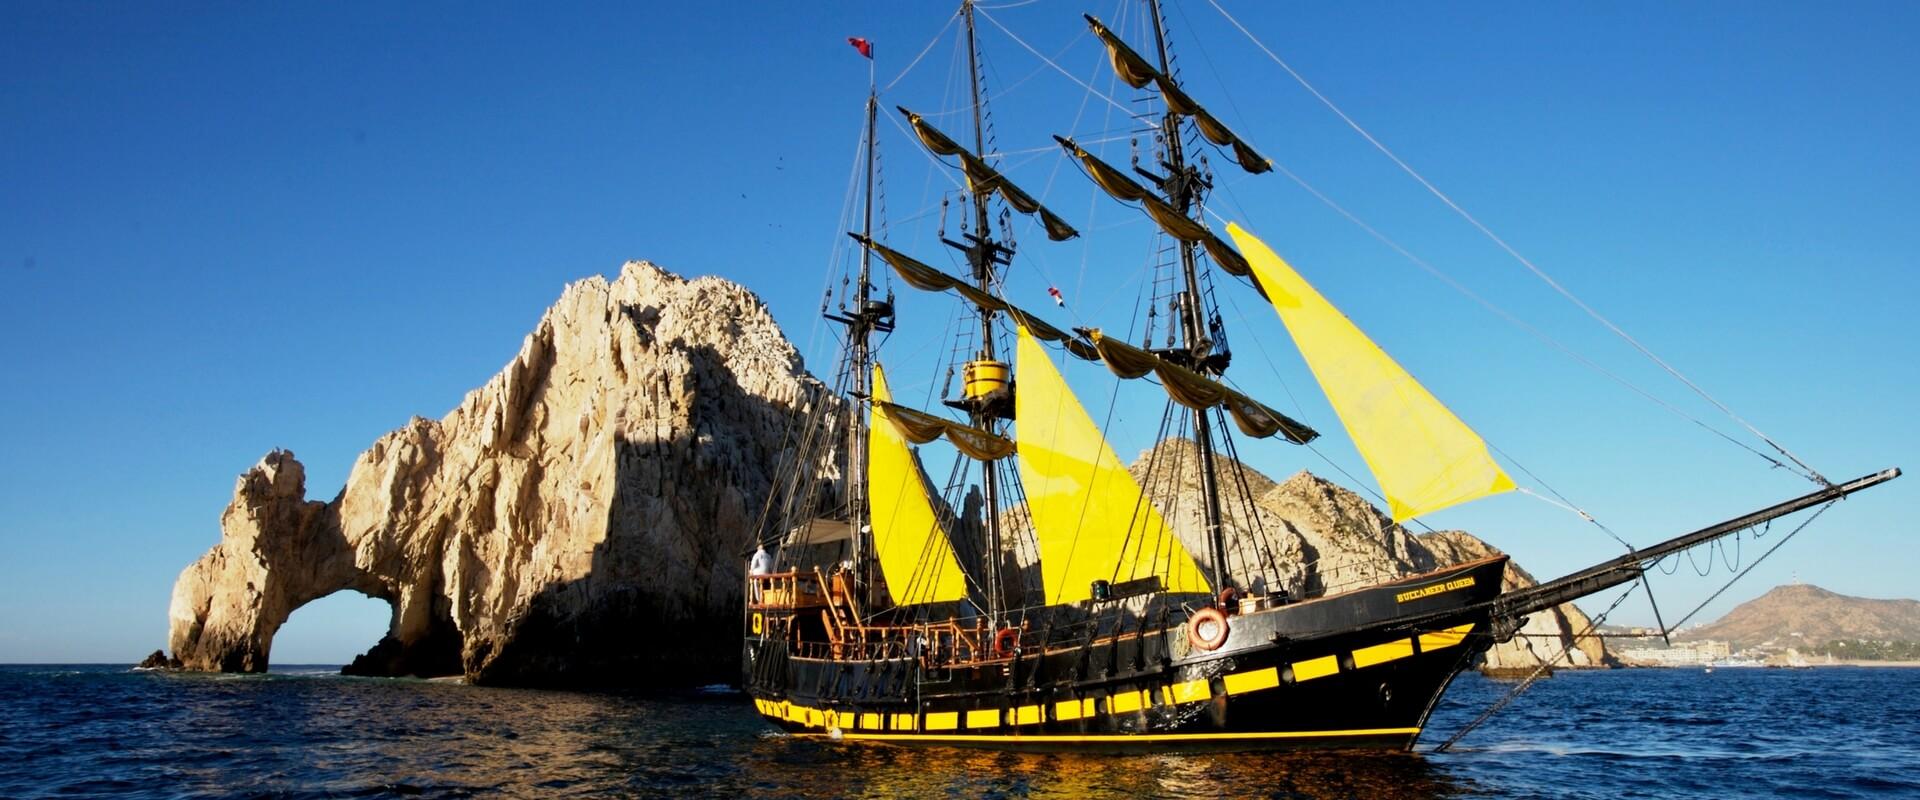 фото тур на корабле пиратов в Мексике